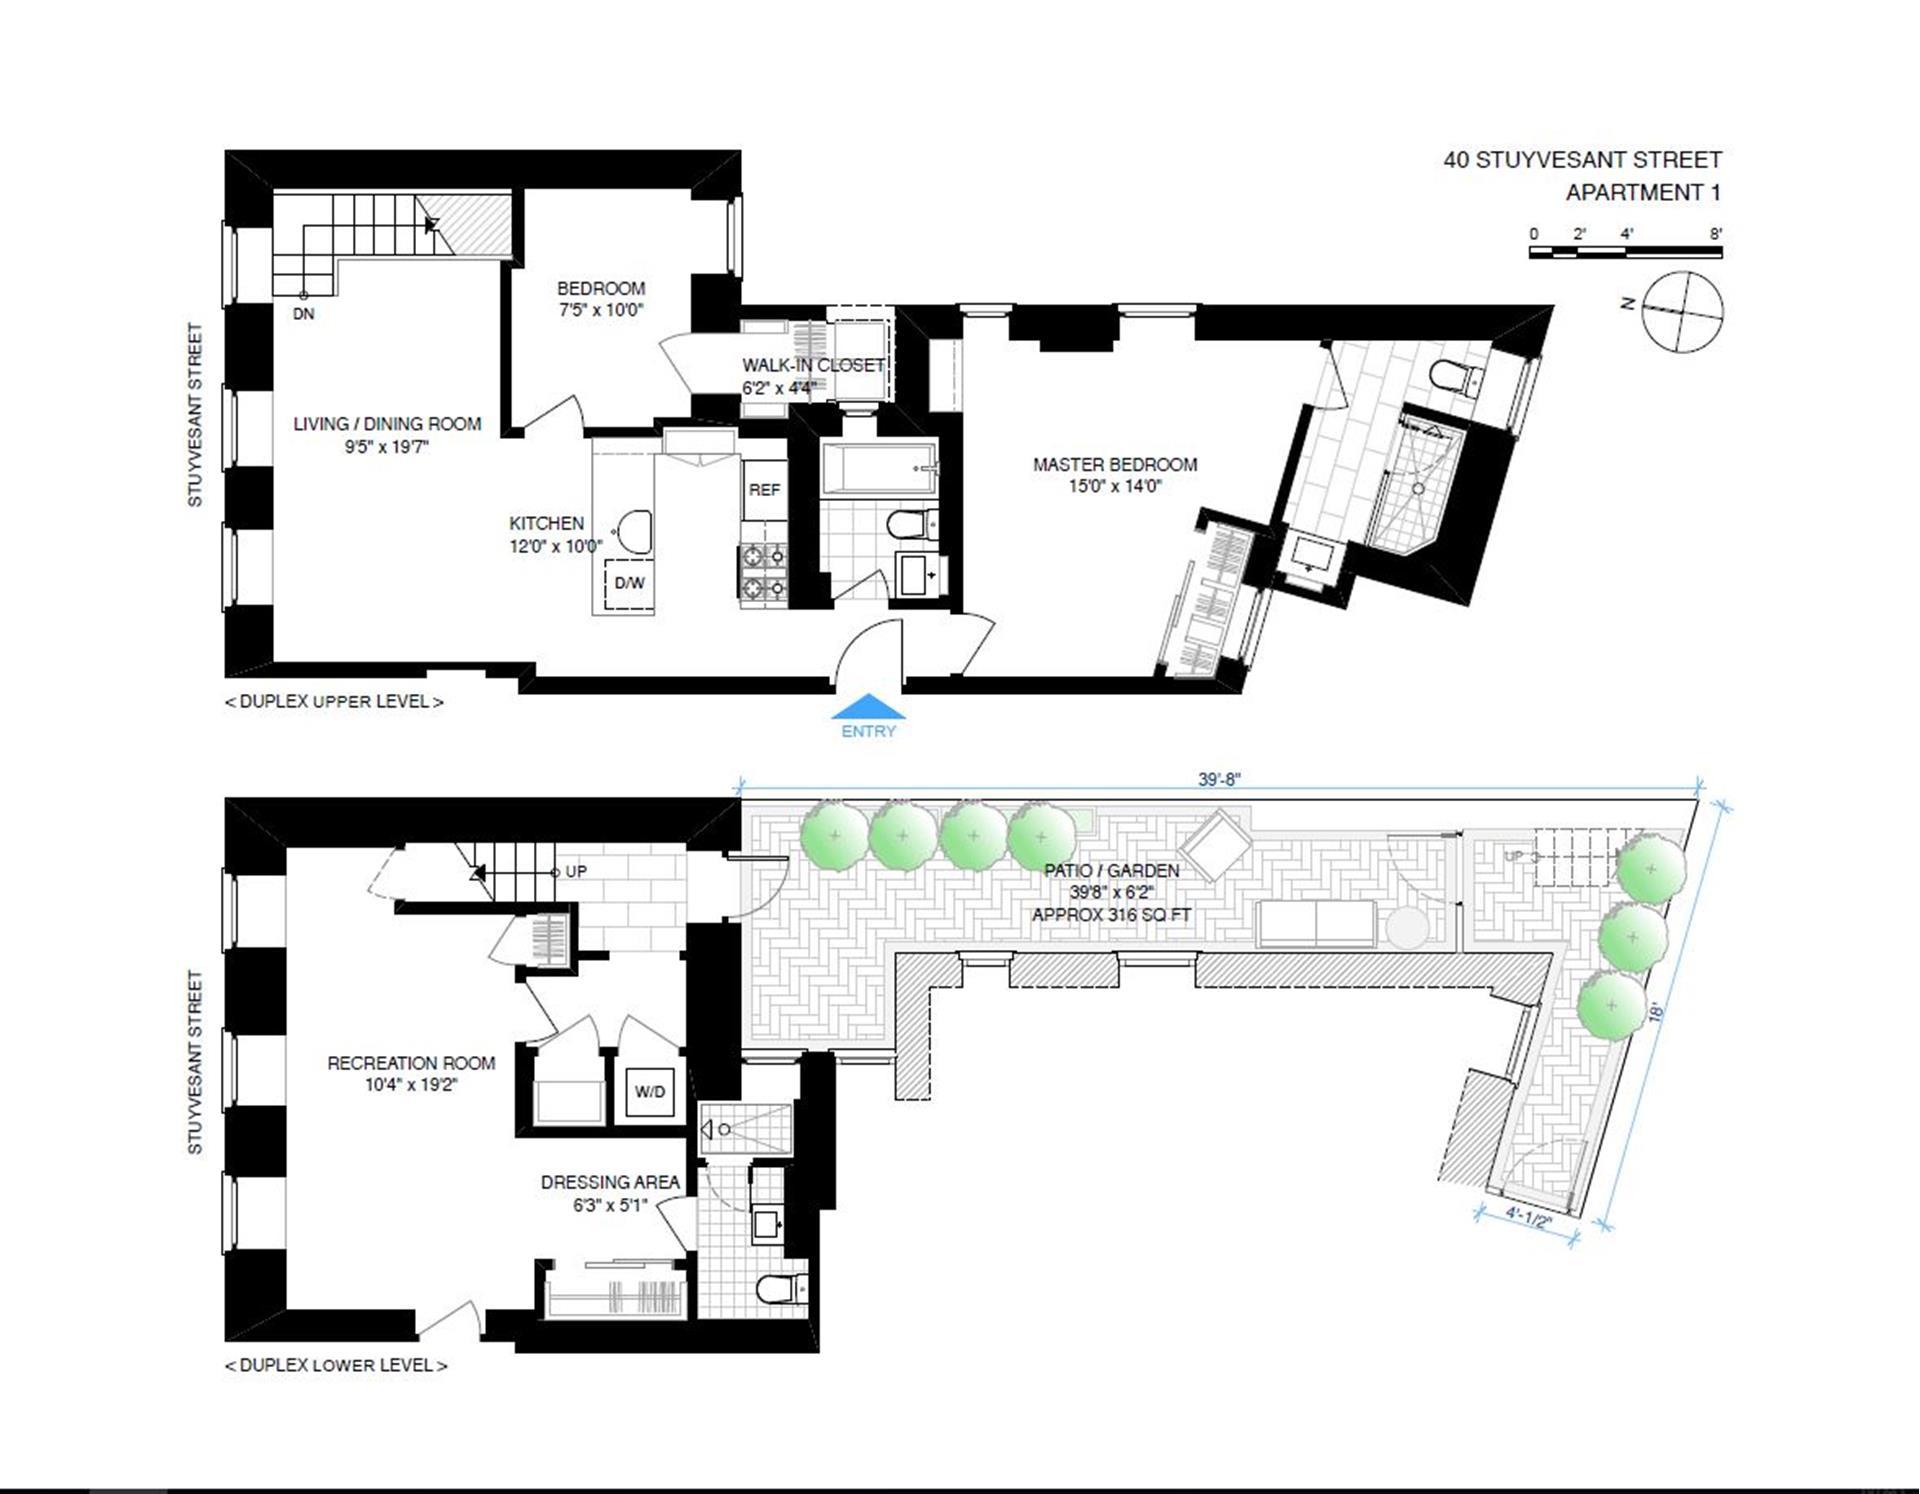 Floor plan of 40 Stuyvesant St, 1 - East Village, New York